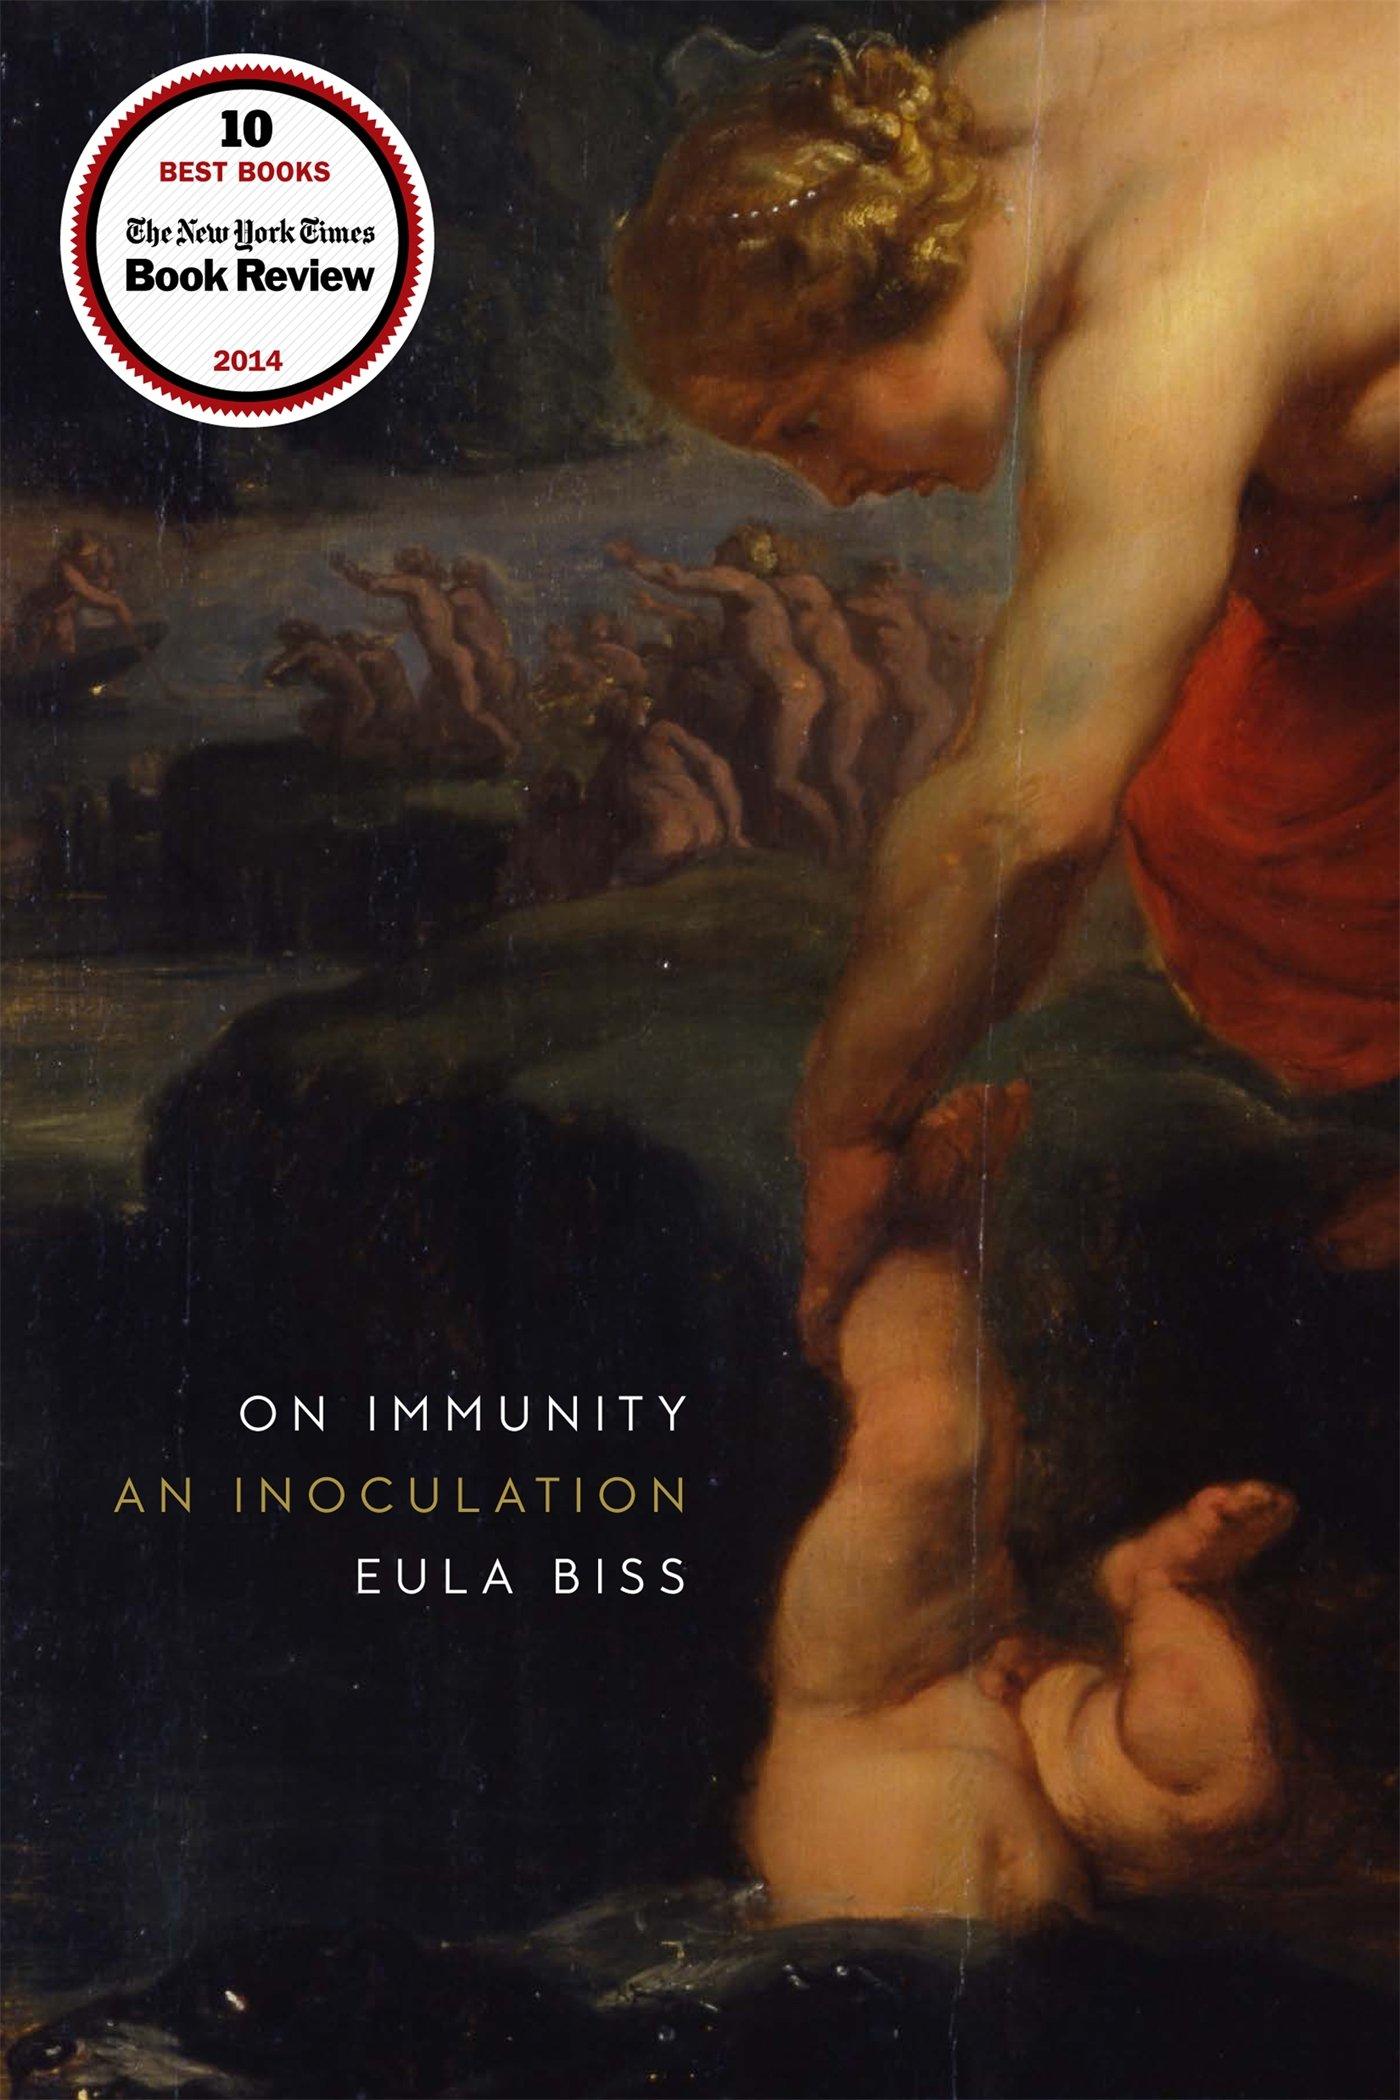 On Immunity Summary